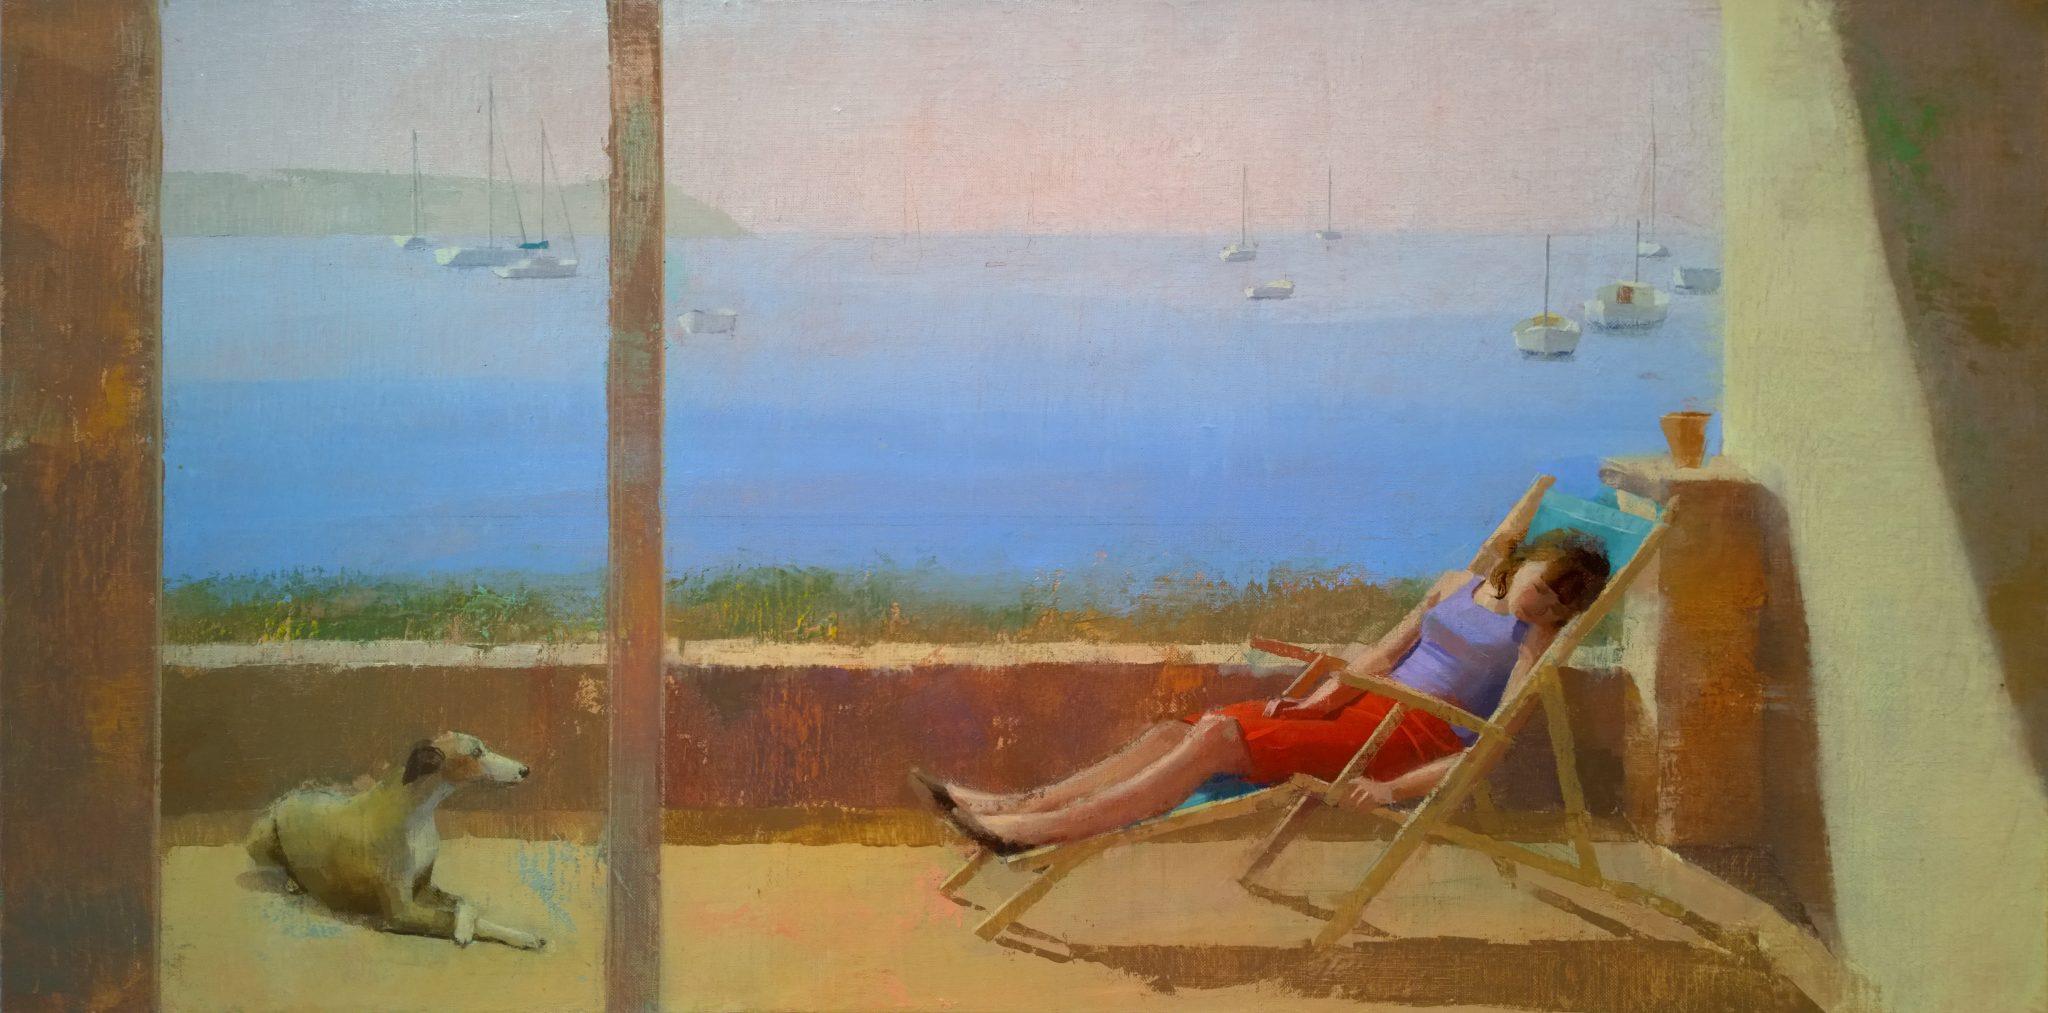 siesta-alejandra-caballero-oleo-ventana-paisaje-mujer-durmiendo-mar-perro-luz-sol